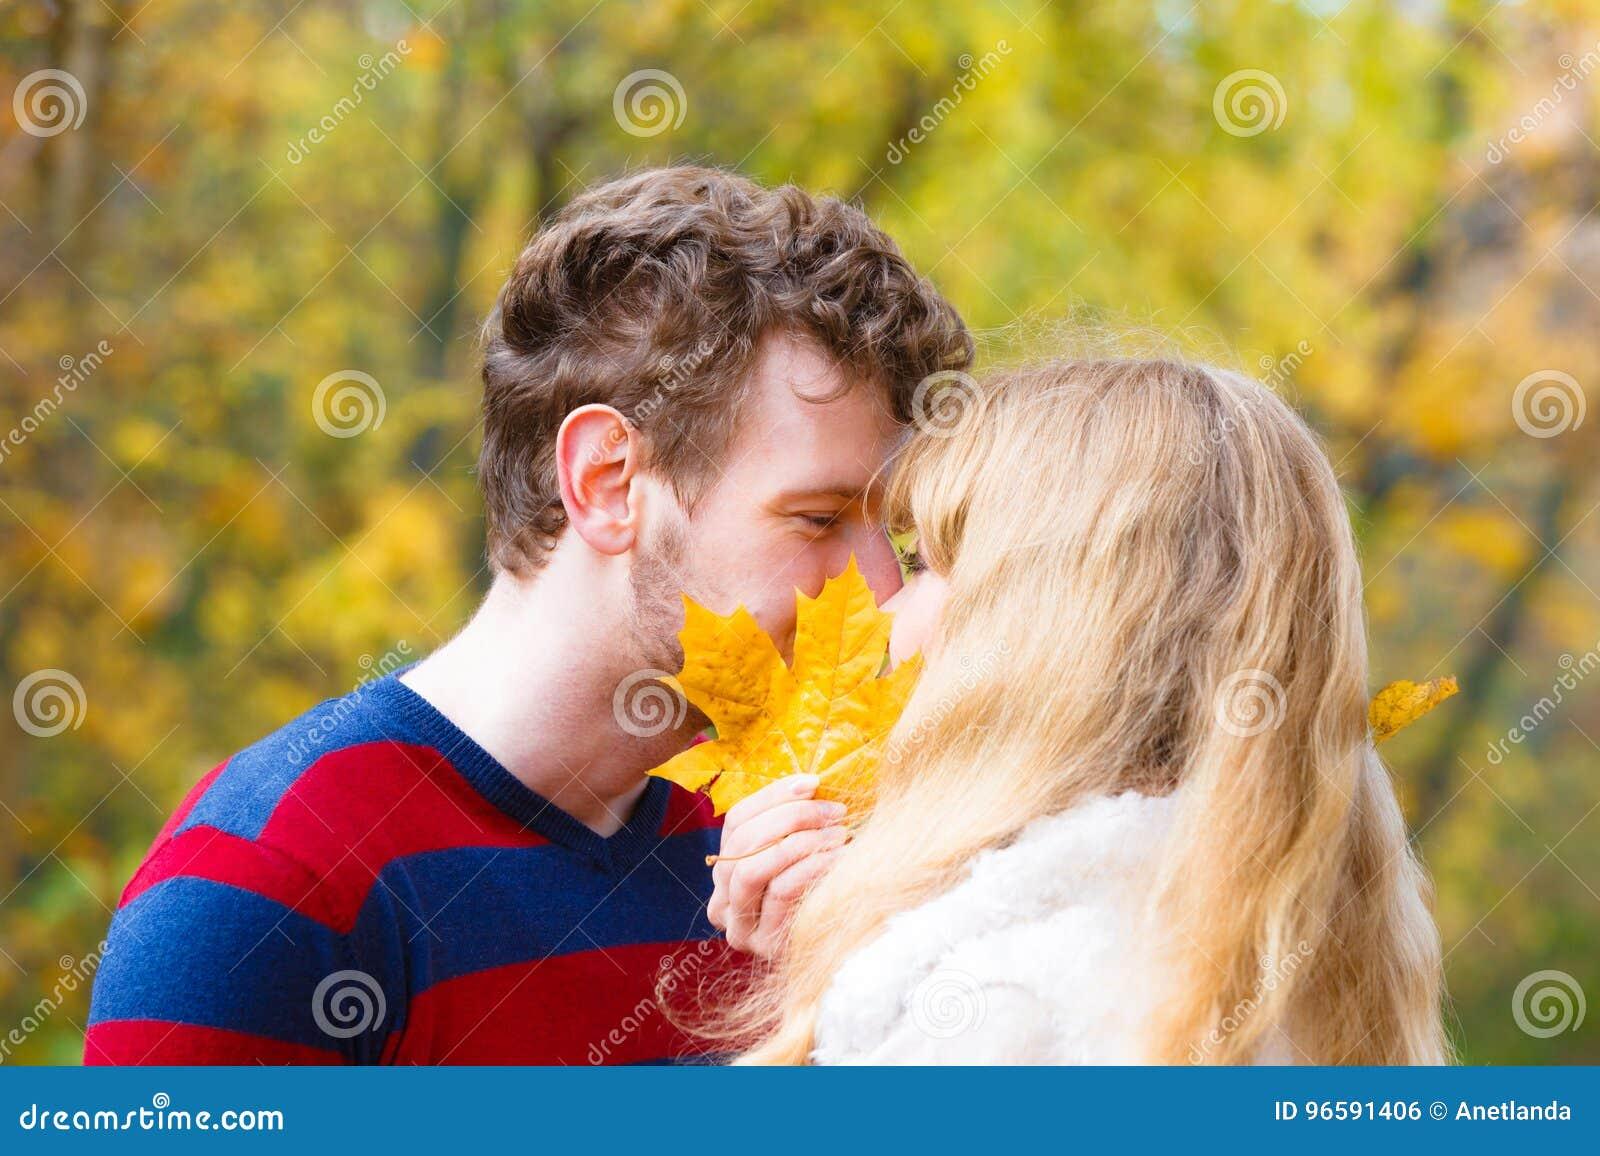 eva mendes dating ryan gosling